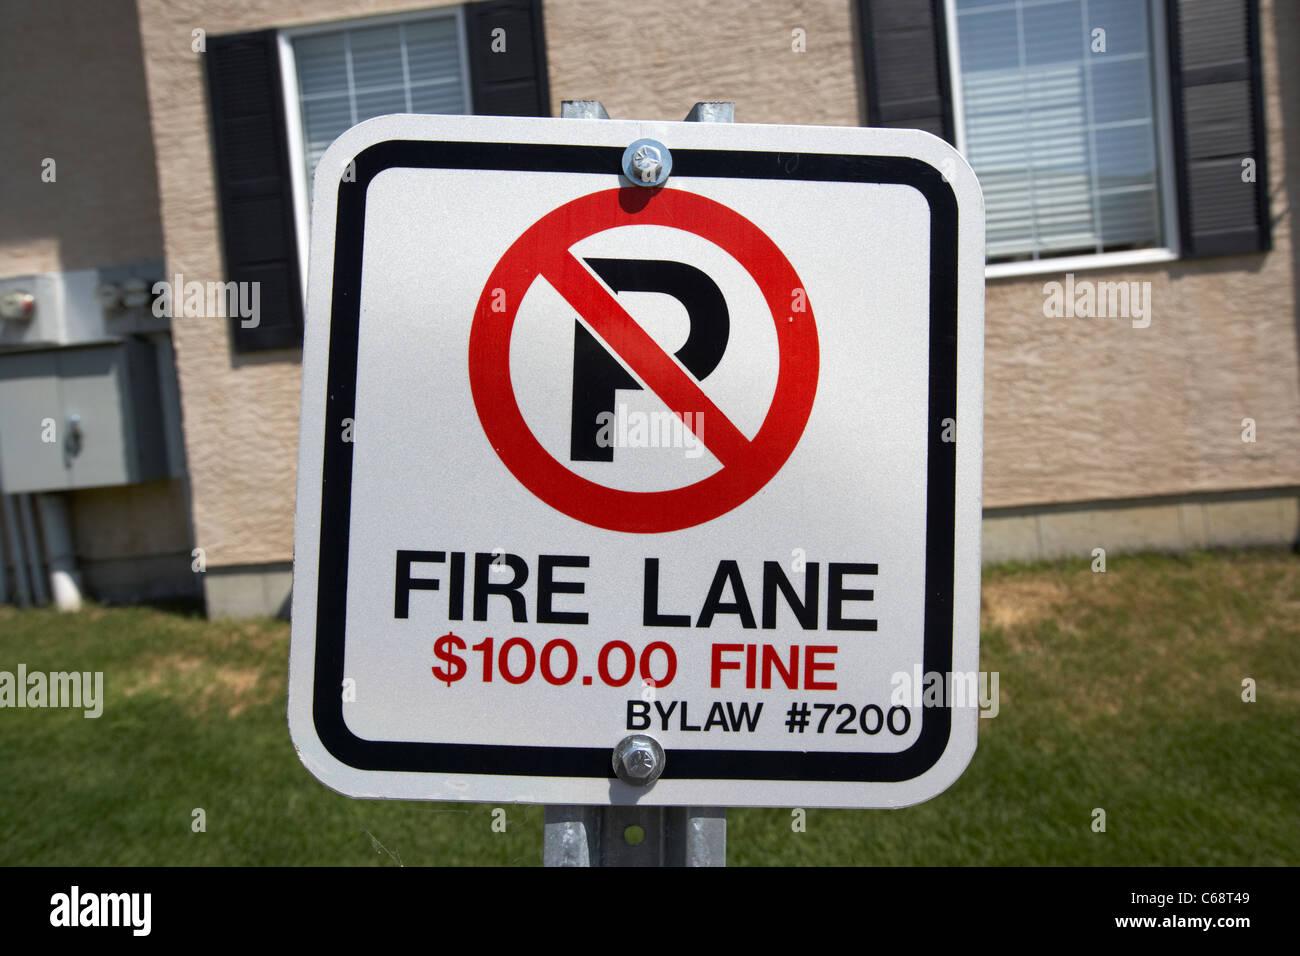 fire lane no parking fine bylaw sign in residential suburb area in Saskatoon Saskatchewan Canada - Stock Image